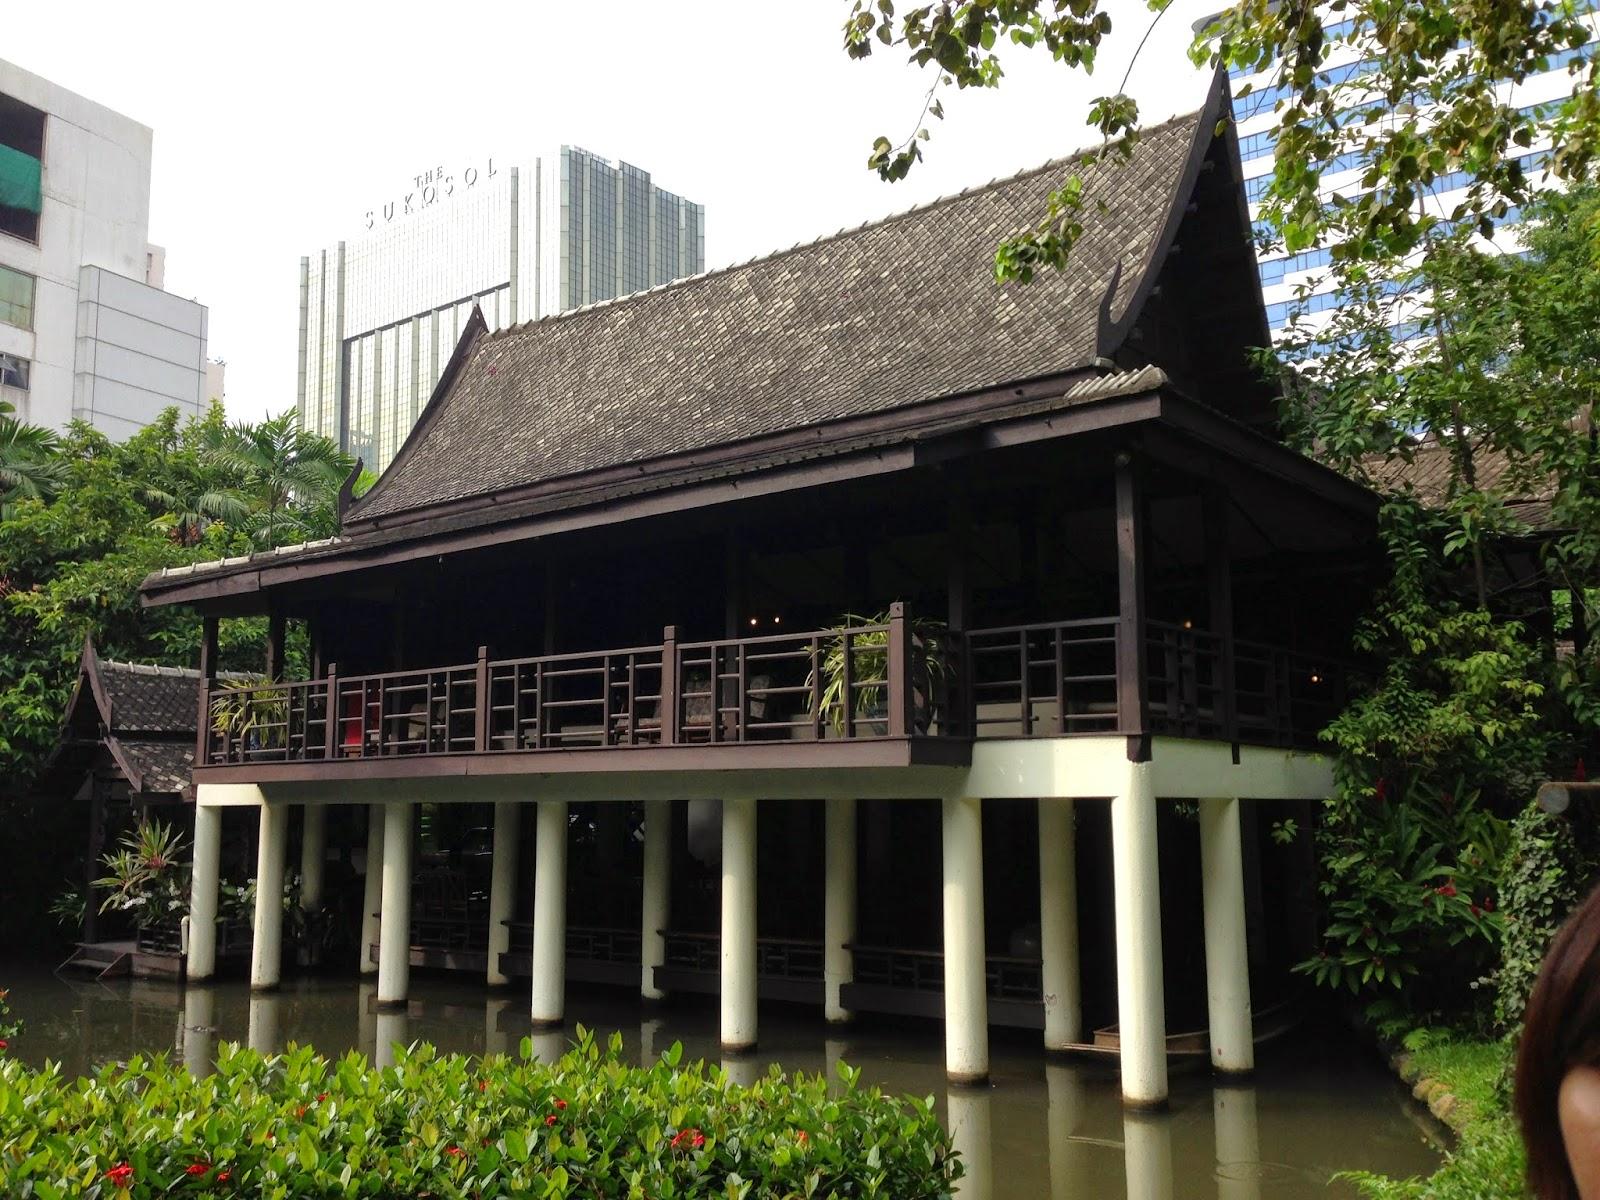 ARCHITHAI.: [建築] Suan Pakkad Palace Museum